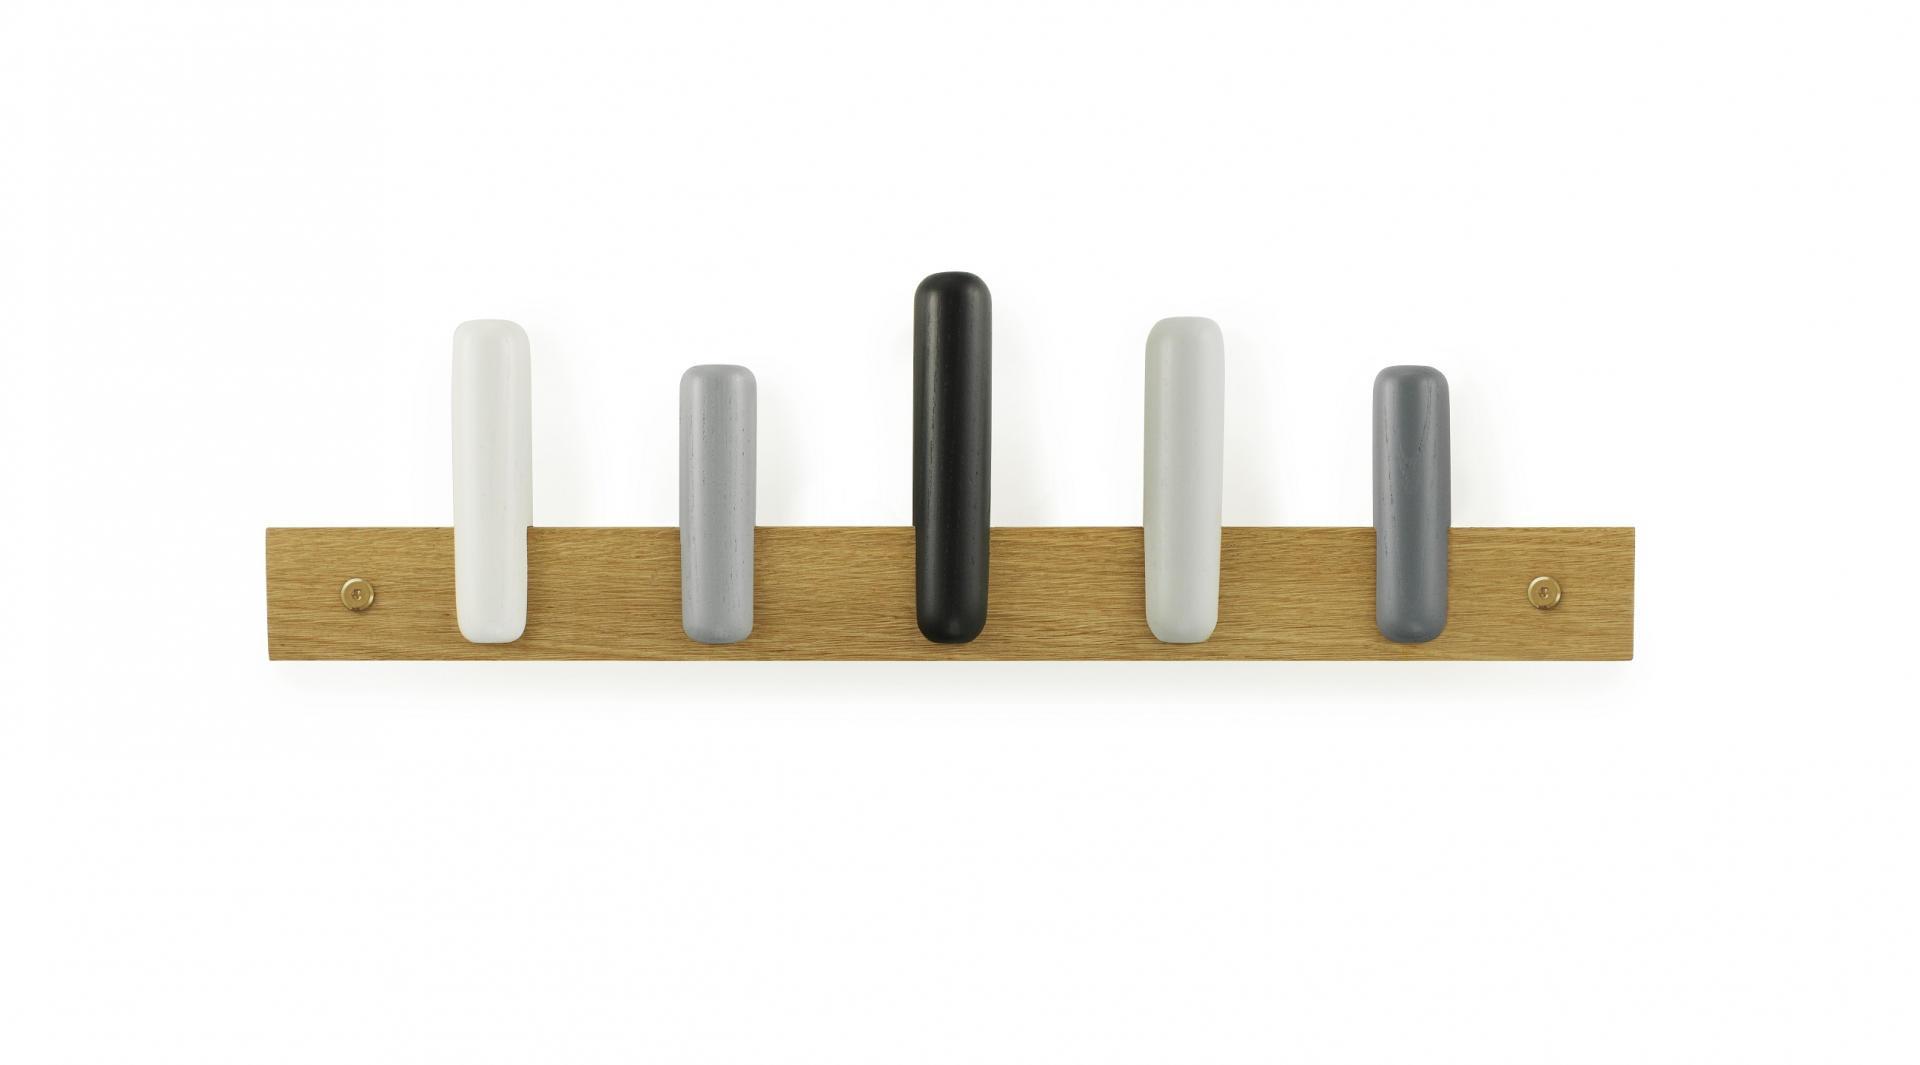 normann COPENHAGEN Dřevěný věšák Play Shadow, šedá barva, černá barva, bílá barva, hnědá barva